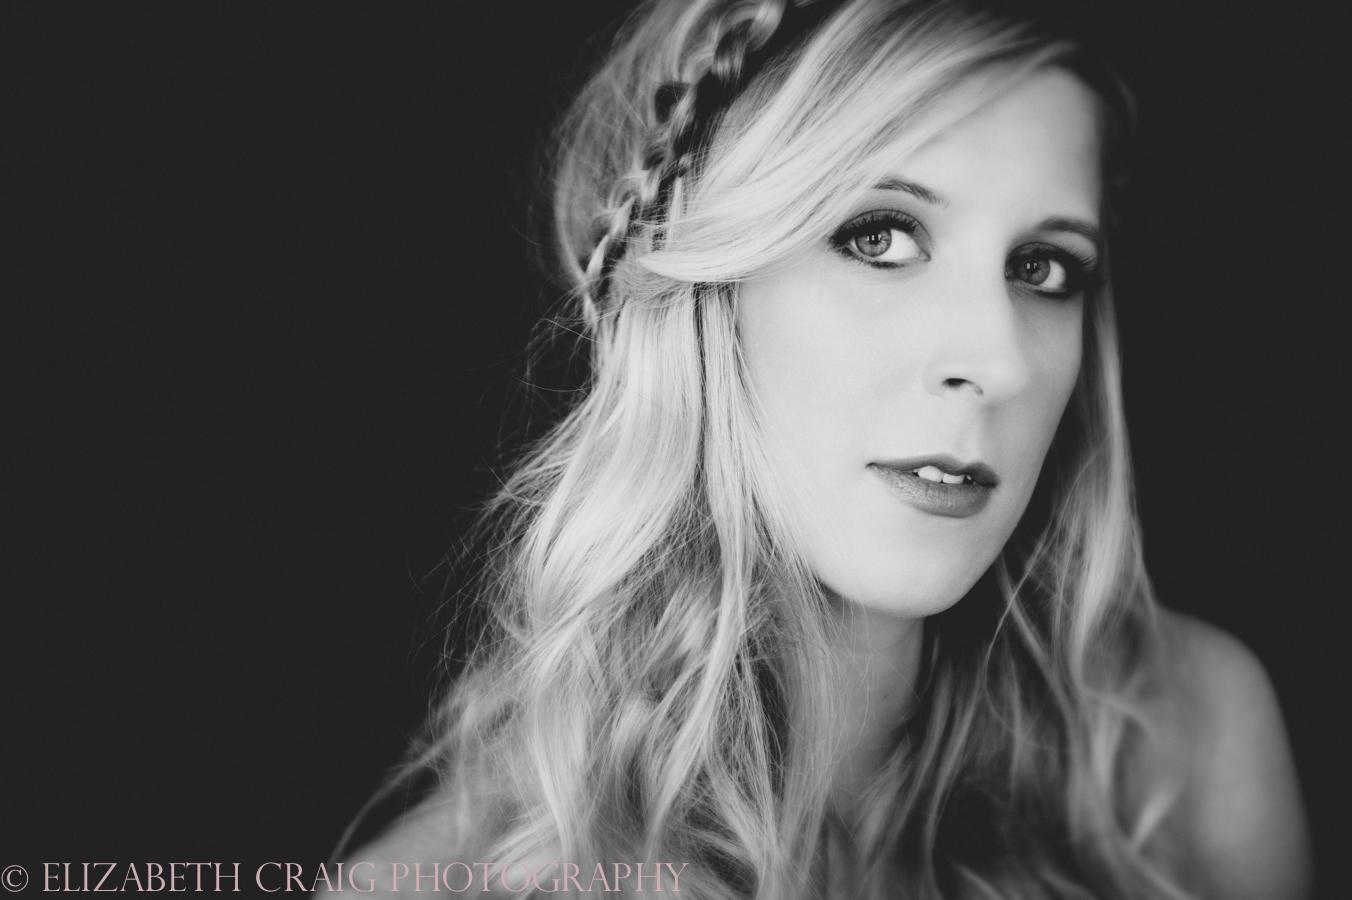 Pittsburgh Portrait Photographer | Boudoir Photographer | Beauty Photographer | Elizabeth Craig Photography Intimates-0007